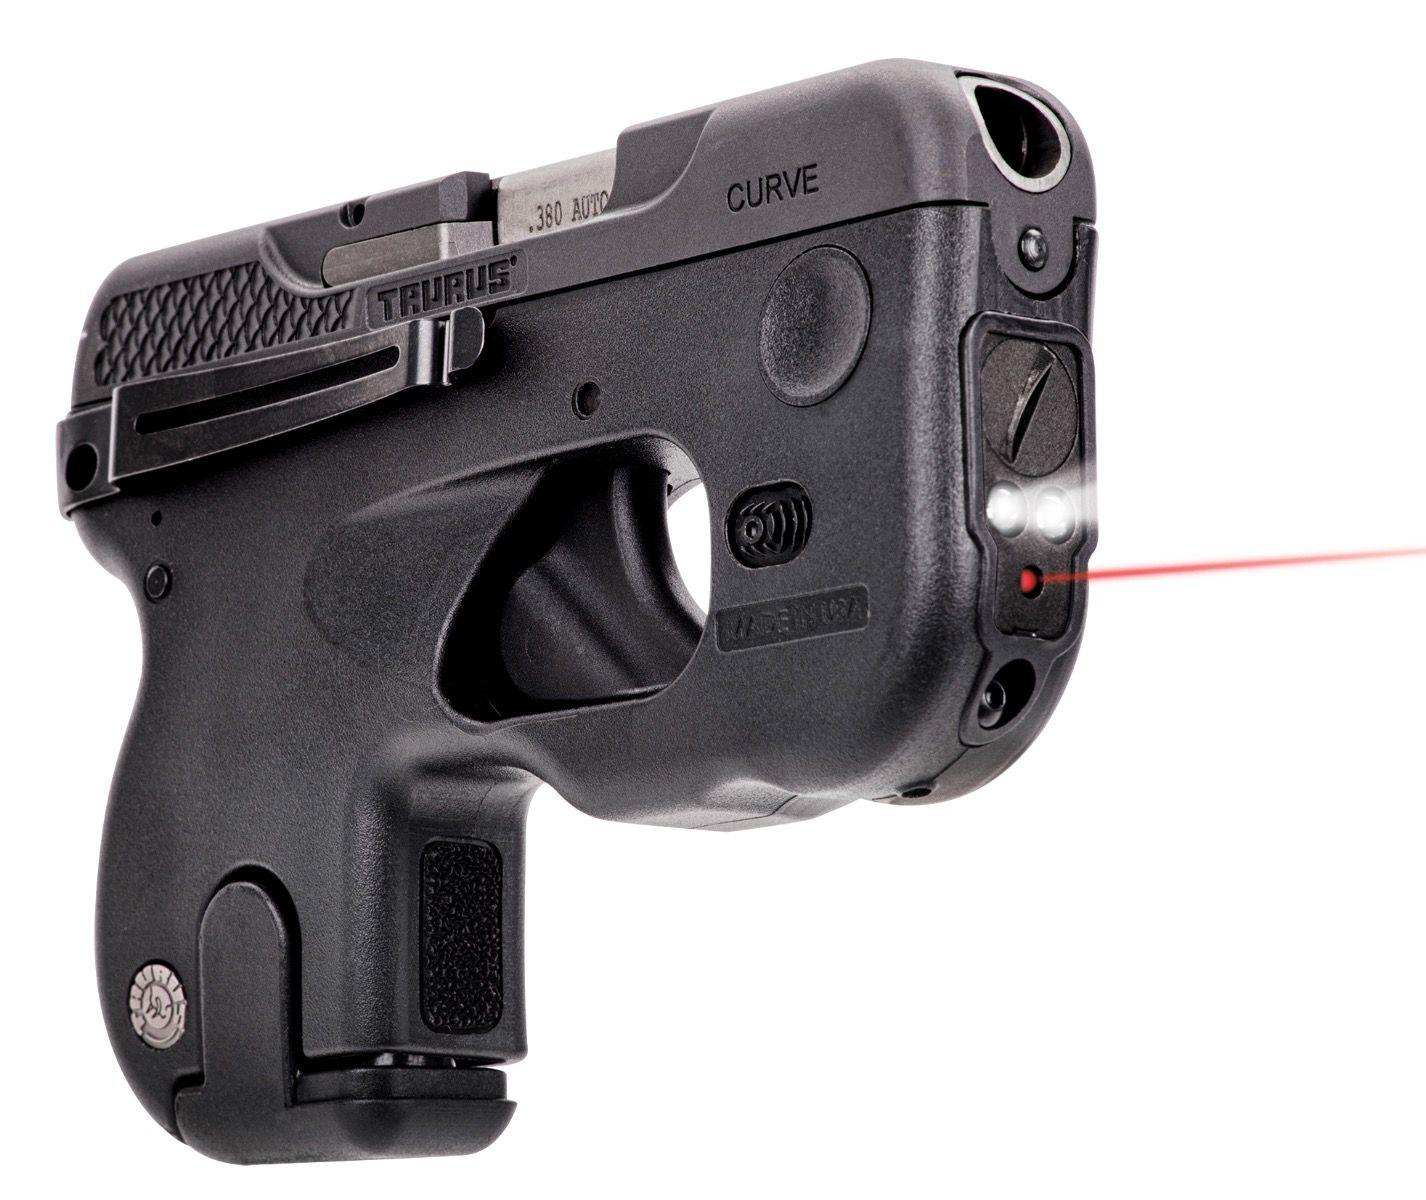 Viridian Taurus Curve Red Laser